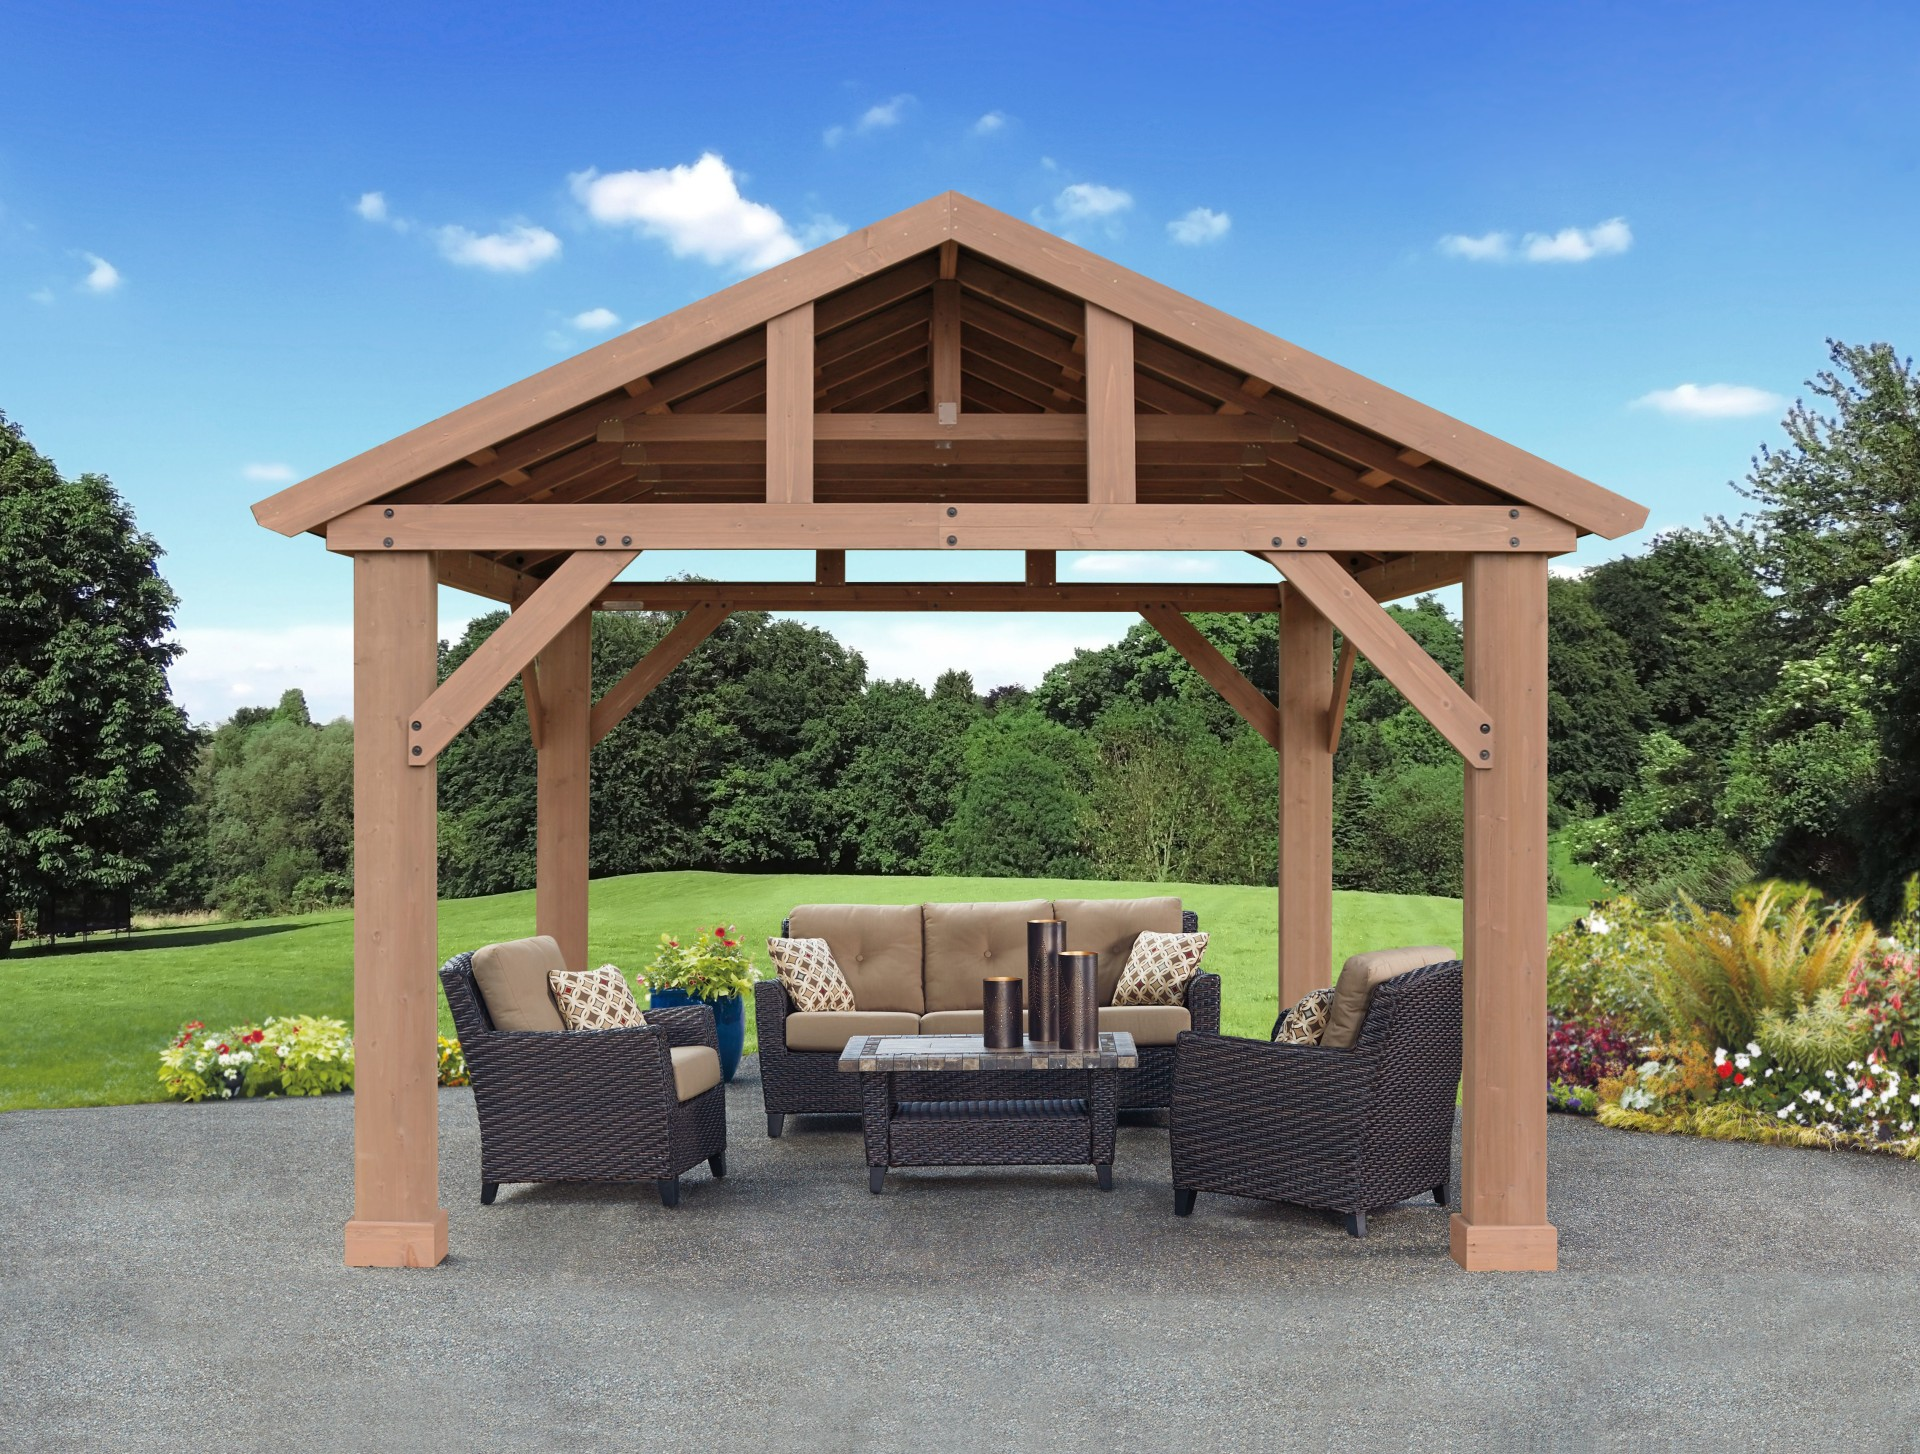 14 x 12 cedar pavilion with aluminum roof